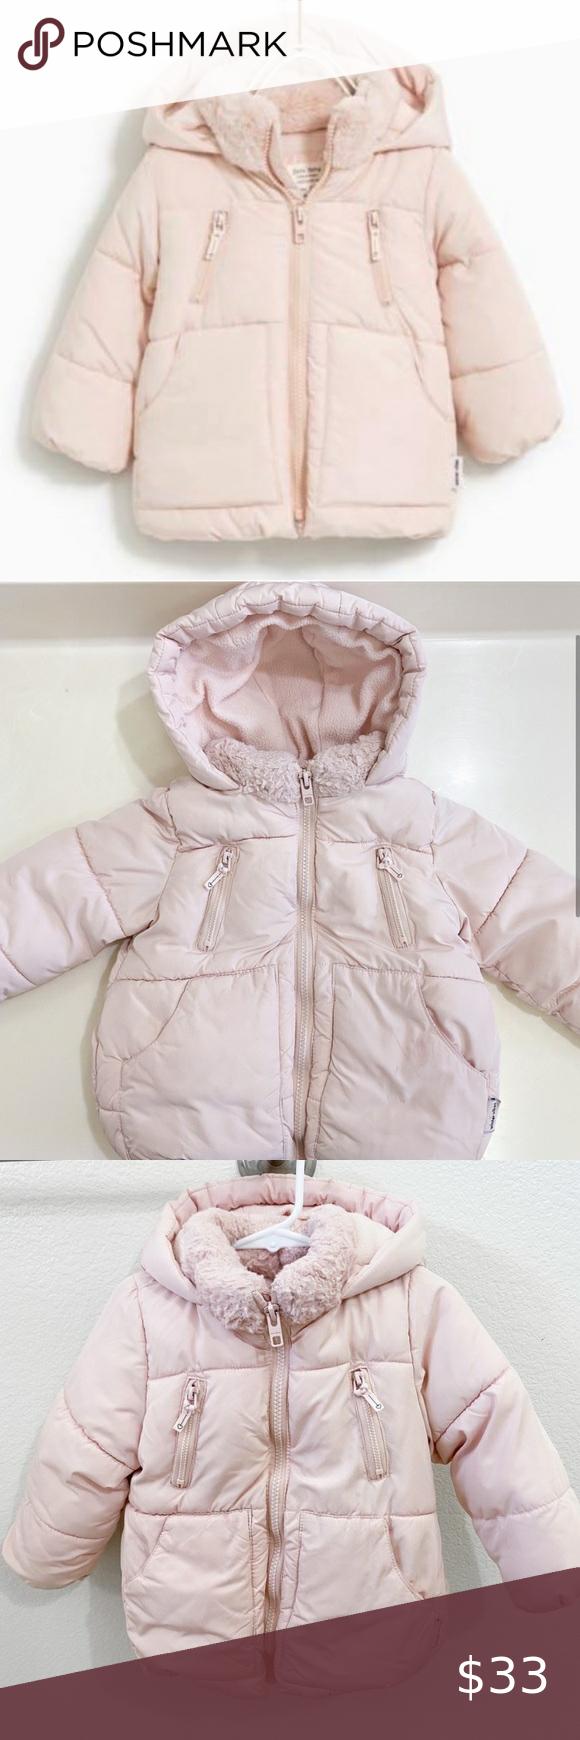 Zara Winter Puffer Jacket Light Pink Size 2 3 Year Winter Puffer Jackets Zara Winter Baby Outerwear [ 1740 x 580 Pixel ]